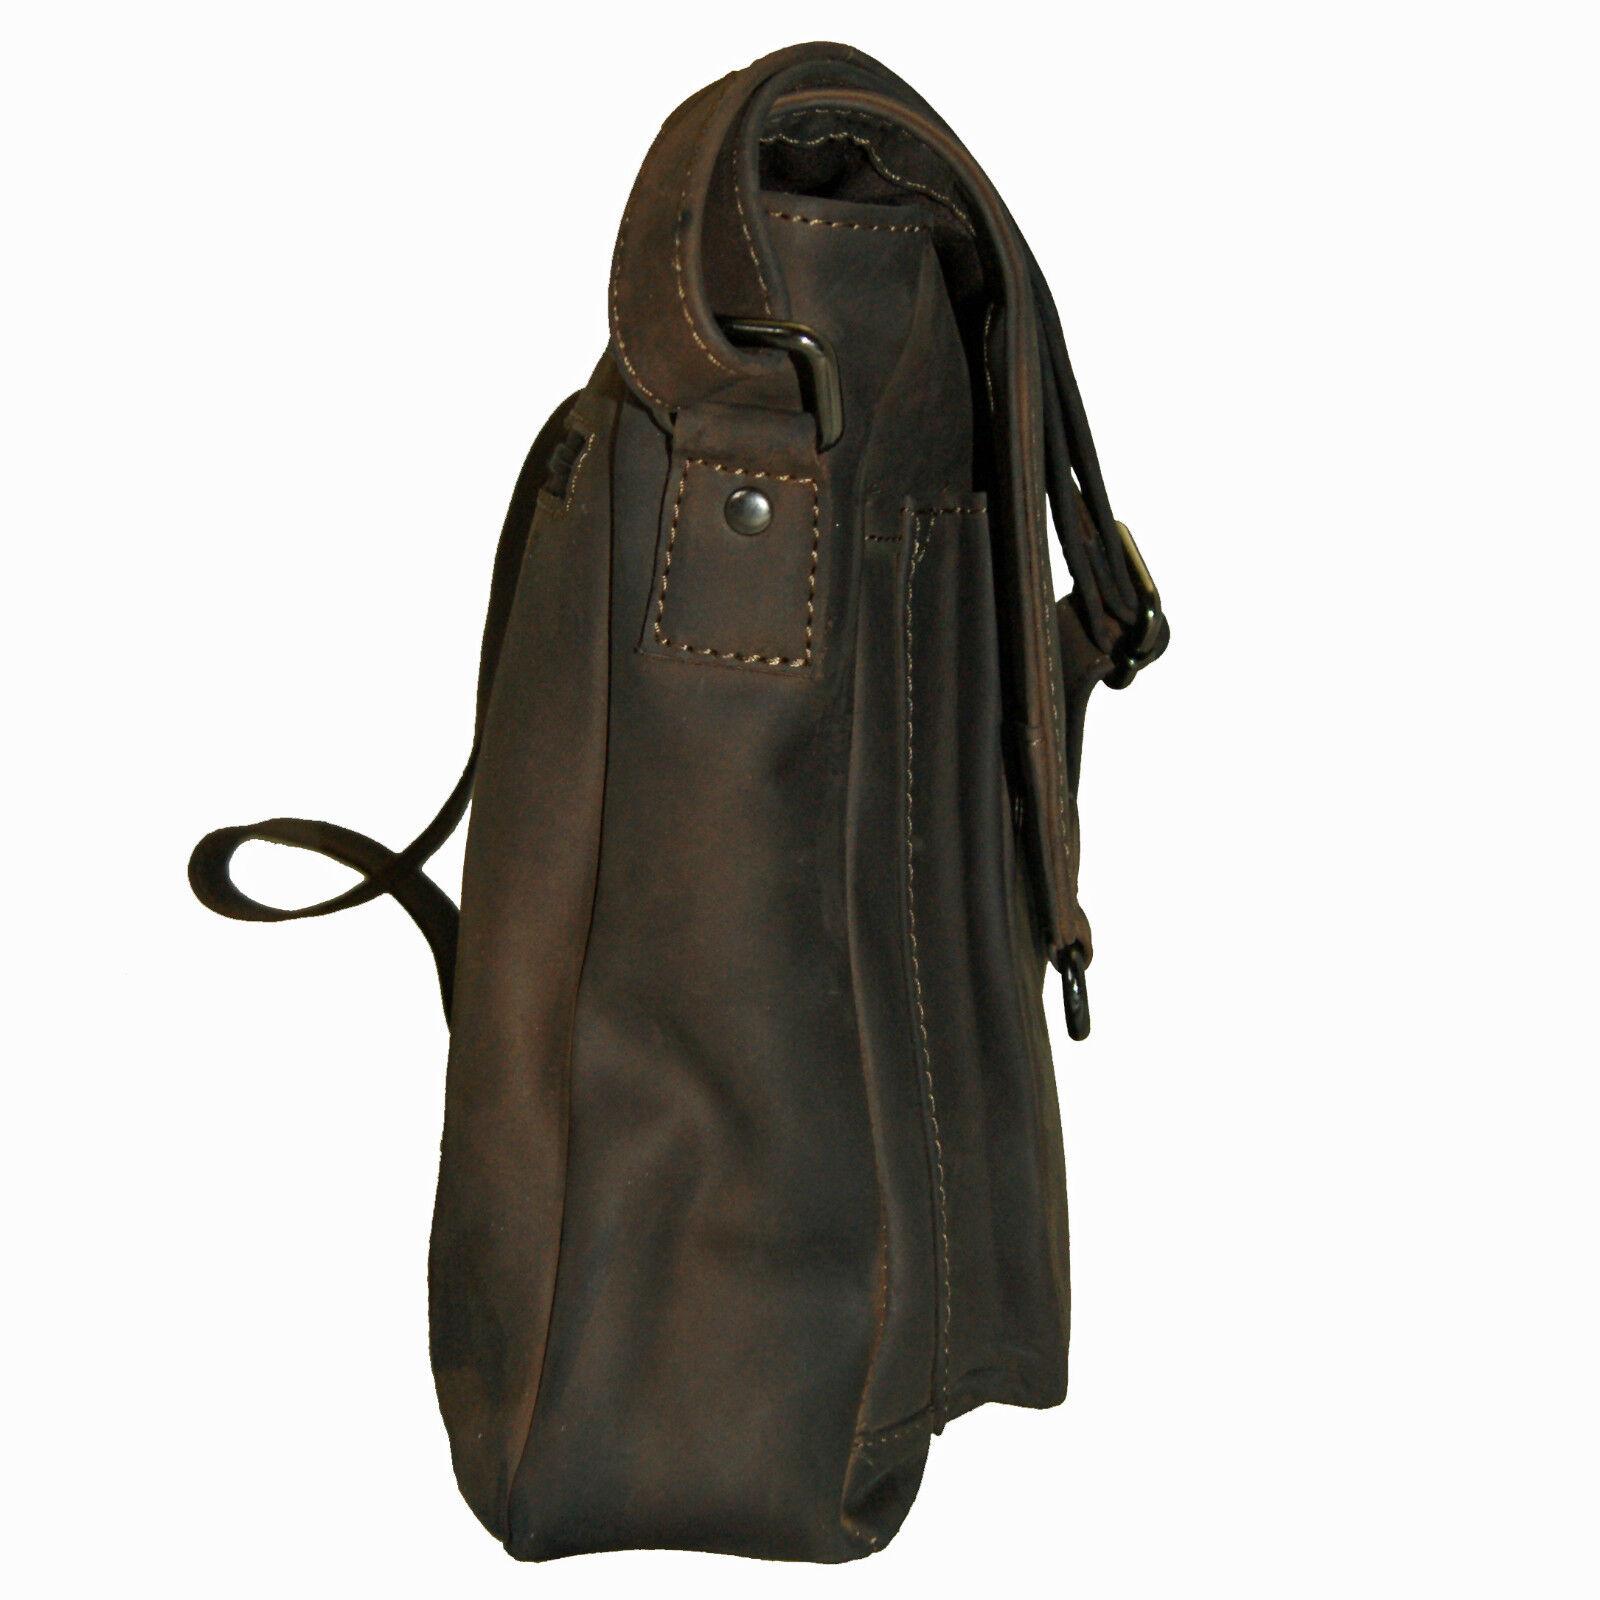 Schultertasche - Umhängetasche BALBOA aus braunem Leder Leder Leder - BARON of MALTZAHN   2019  0e8062